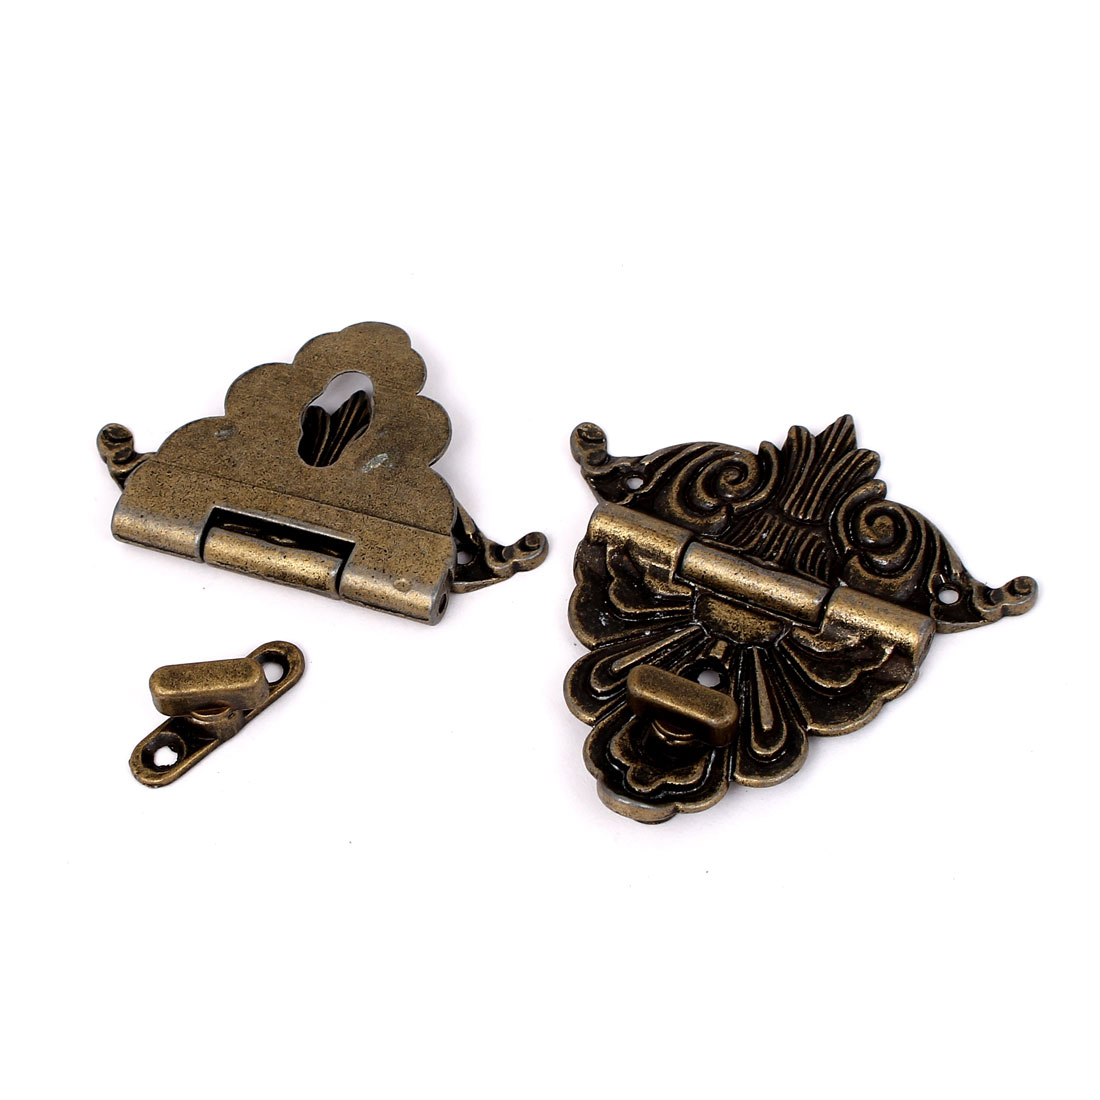 70mmx67mm Vintage Style Wooden Box Case Hook Lock Lid Latch Bronze Tone 2pcs